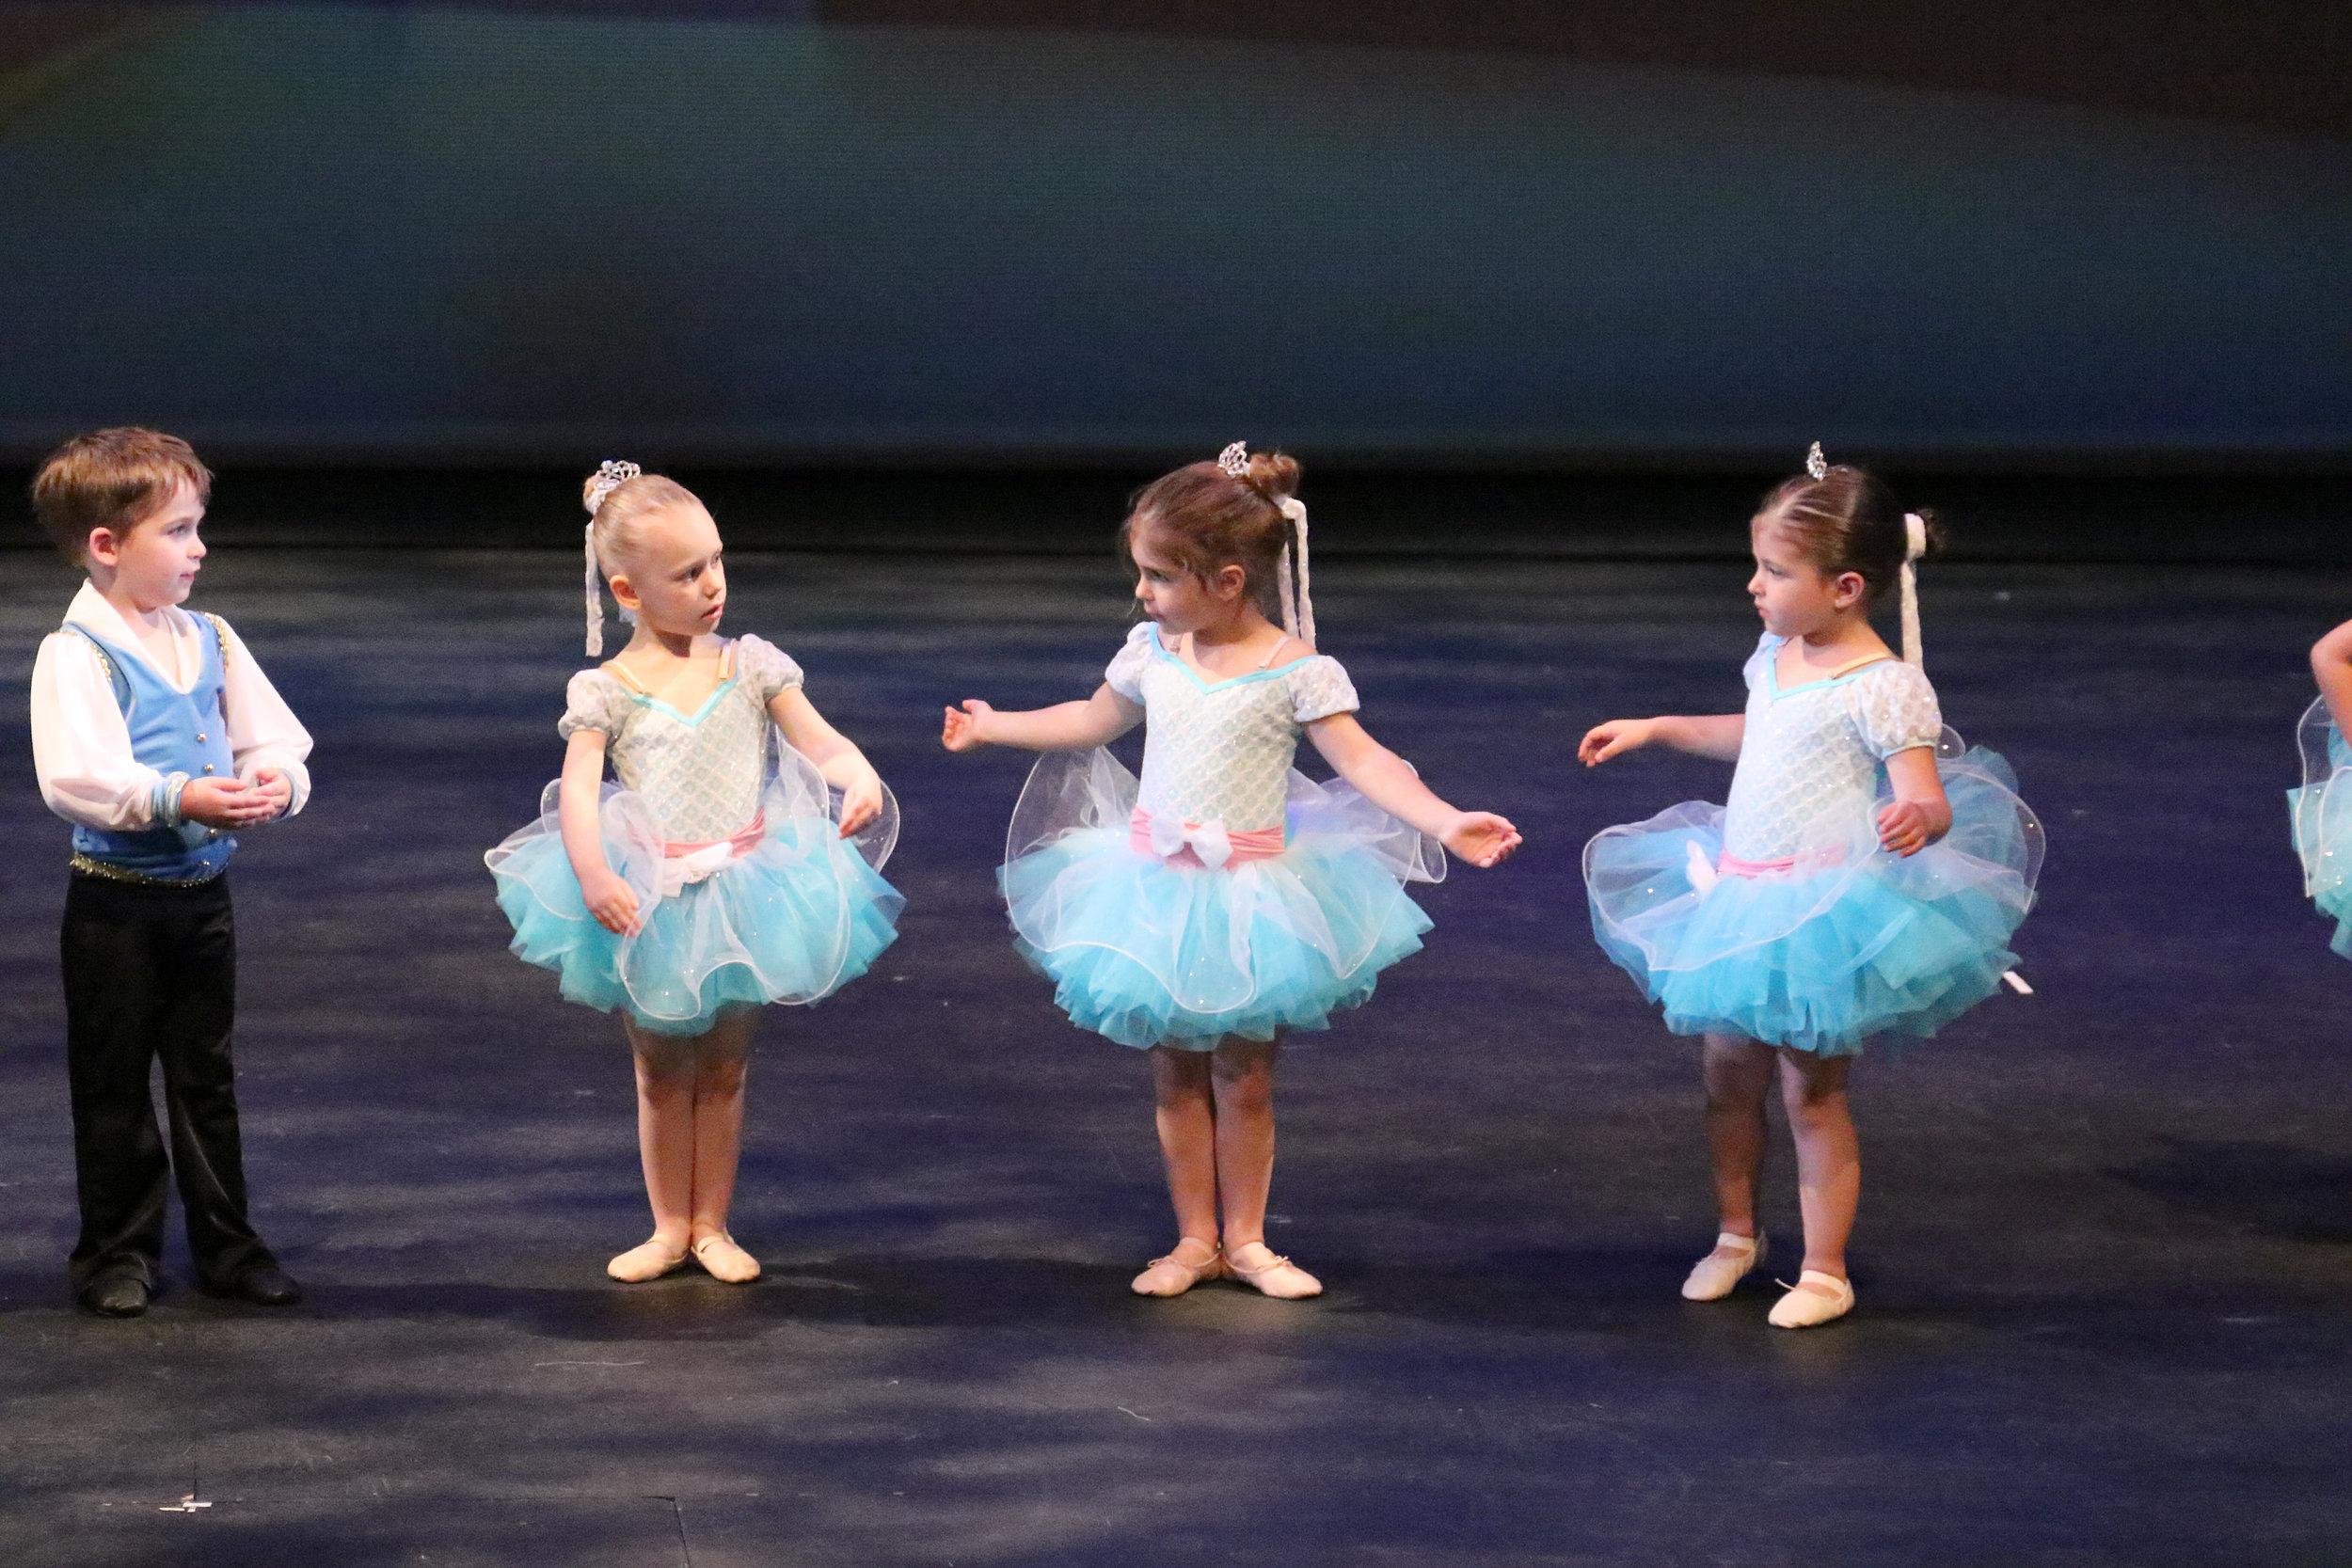 Teaching Kids To Dance Since 1993